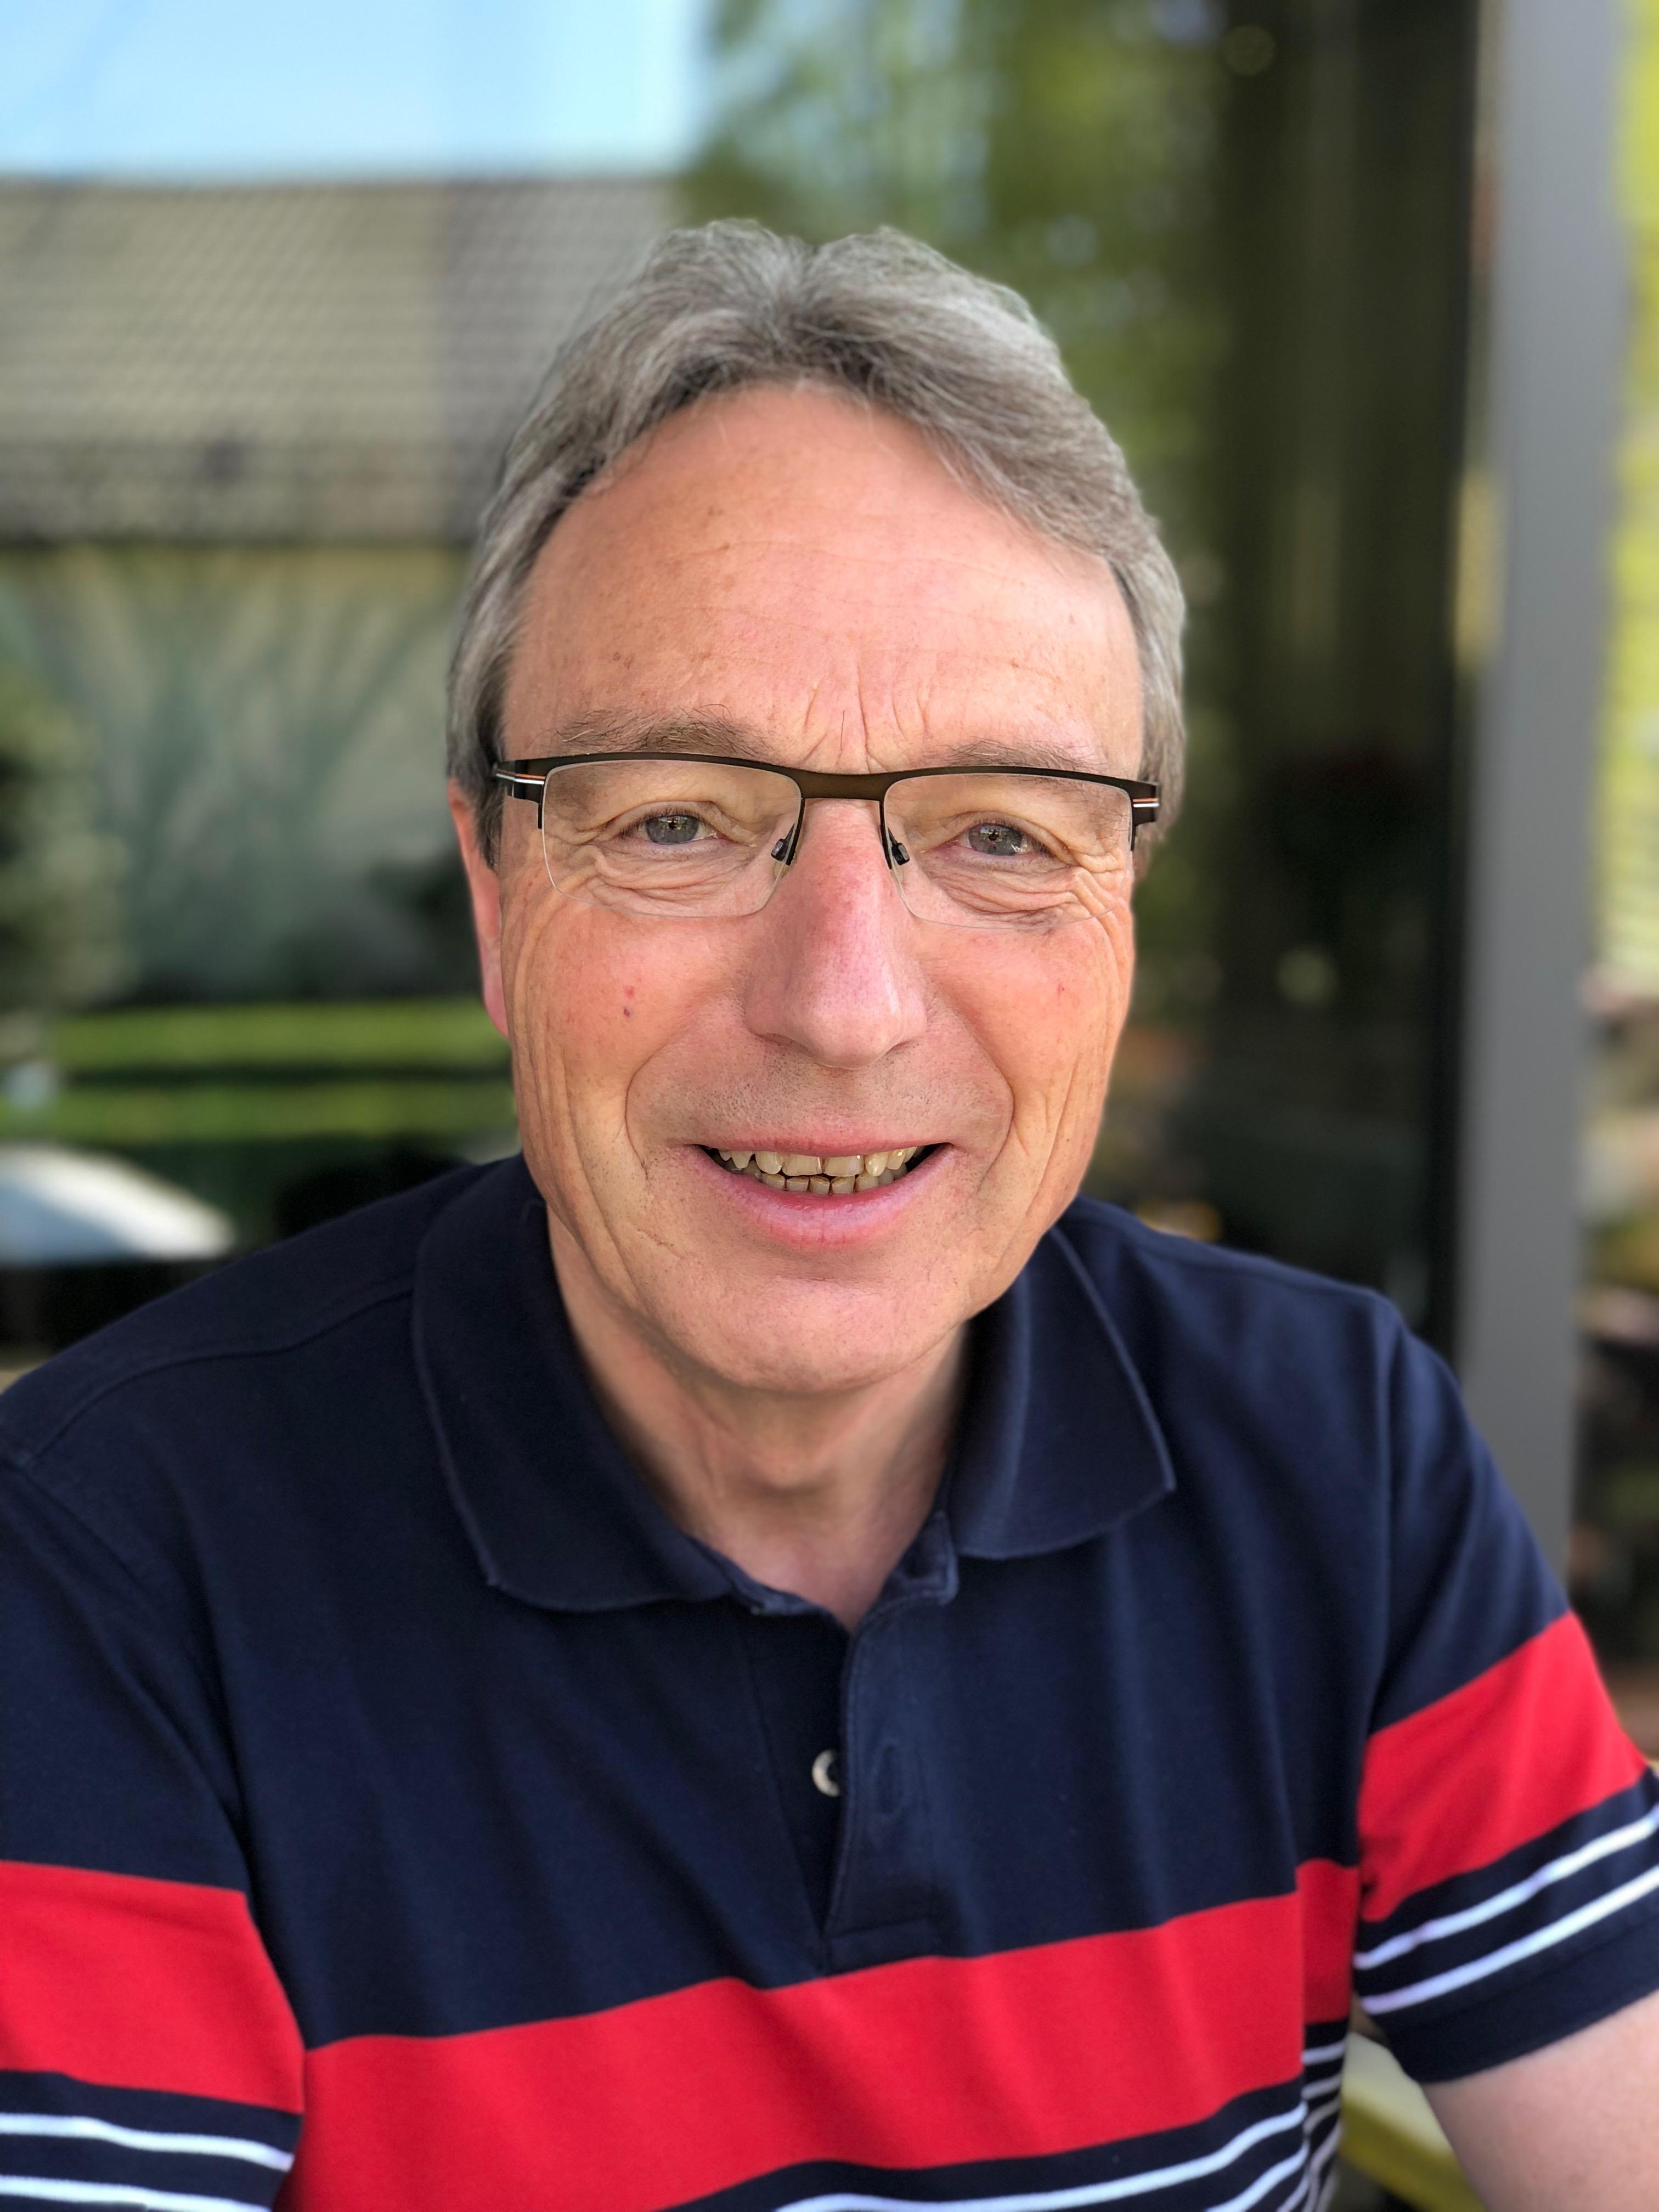 Wolfgang Koczelniak